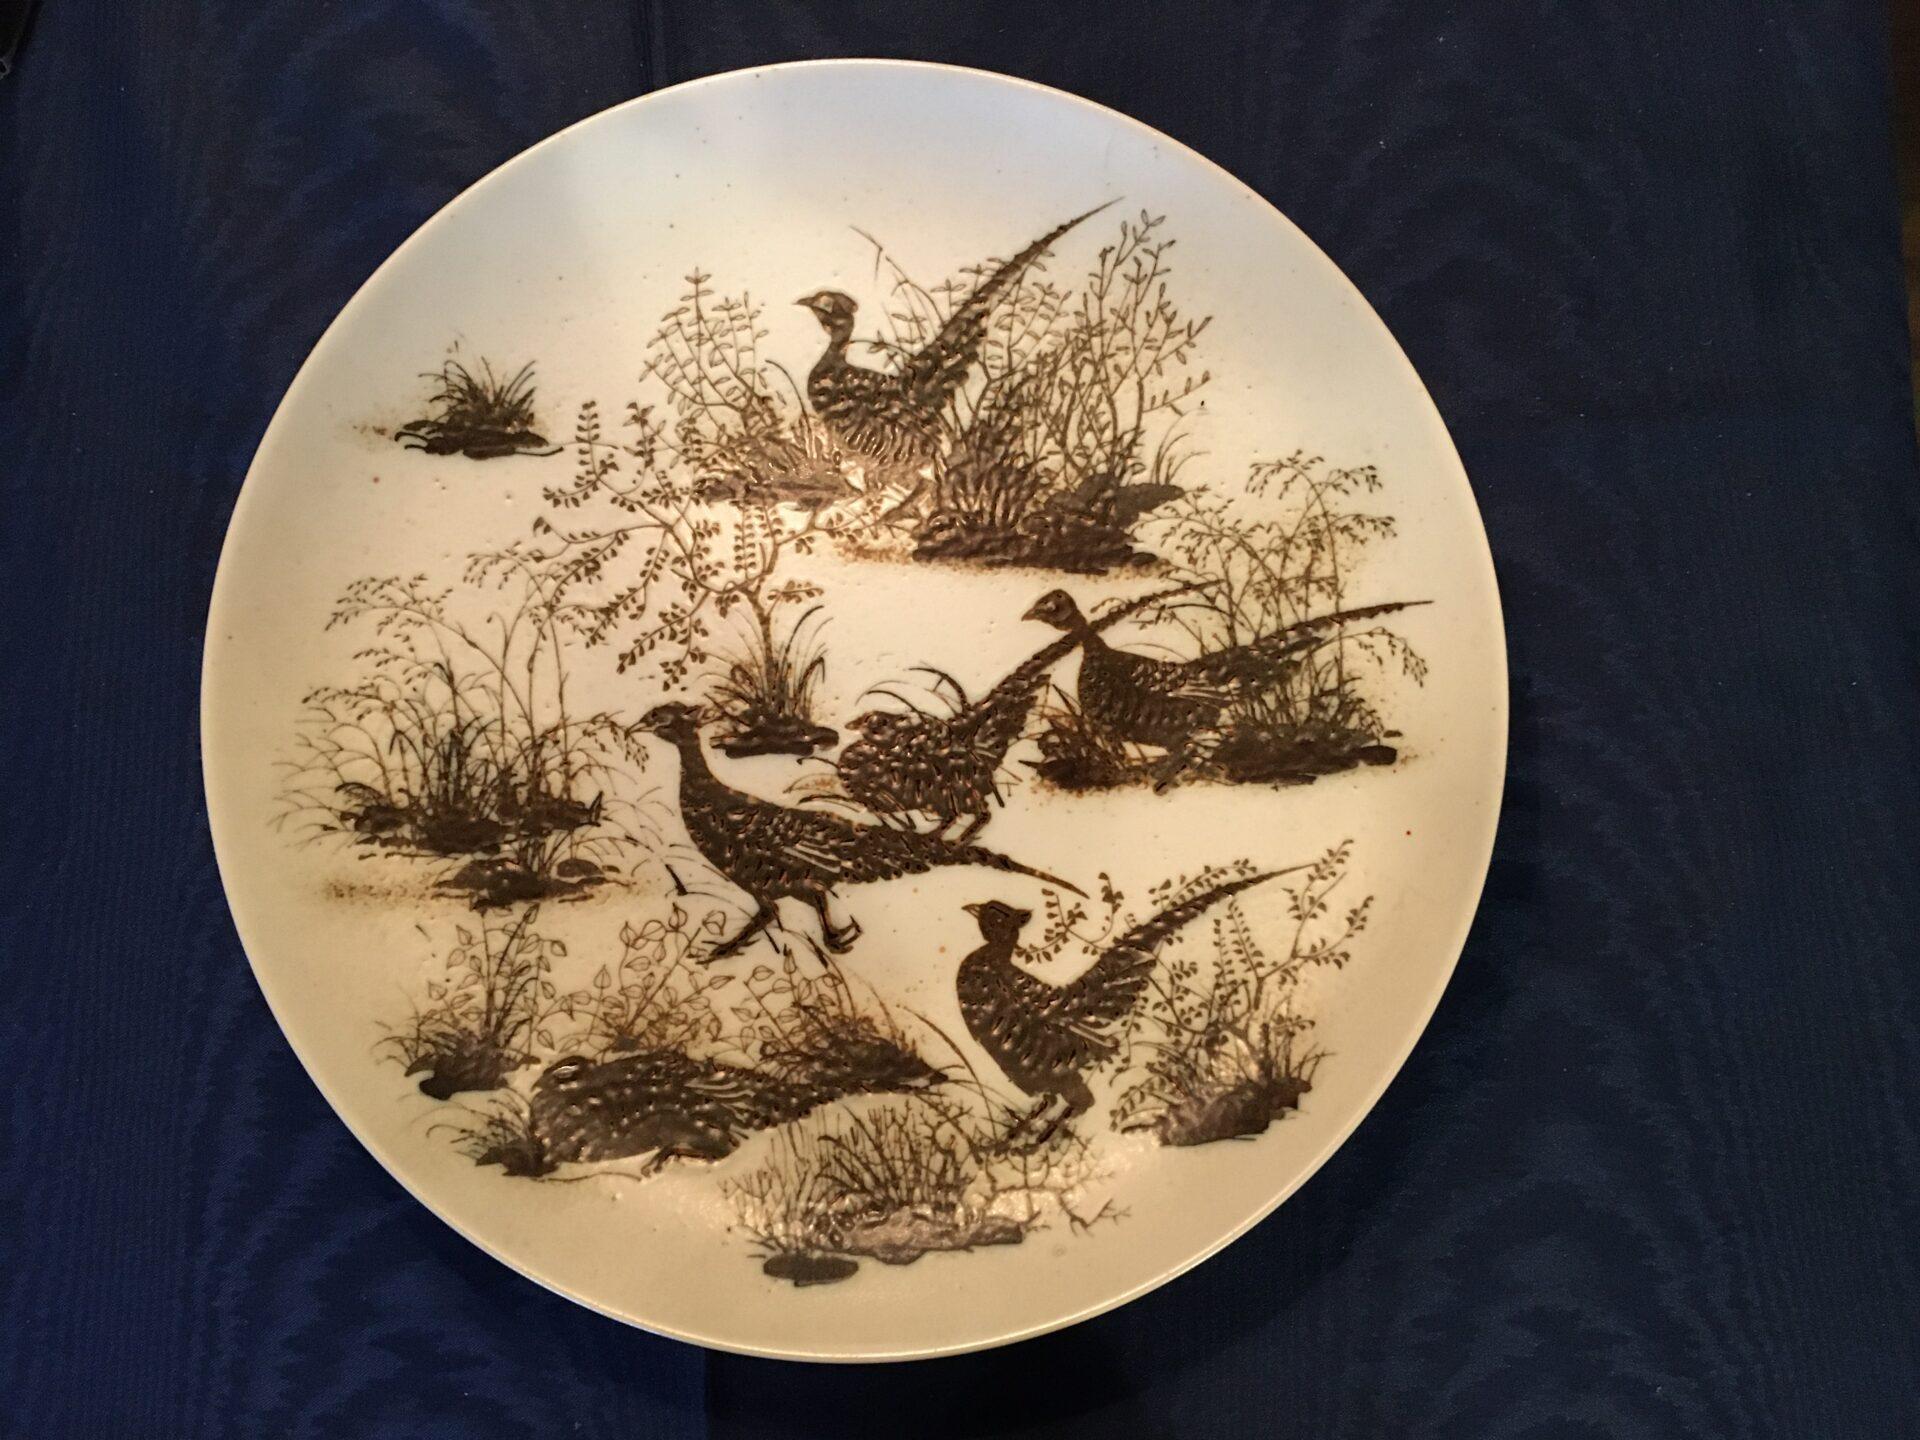 Royal Copenhagen, keramik, Nils Thorsson, d=37 cm, pris 500 kr